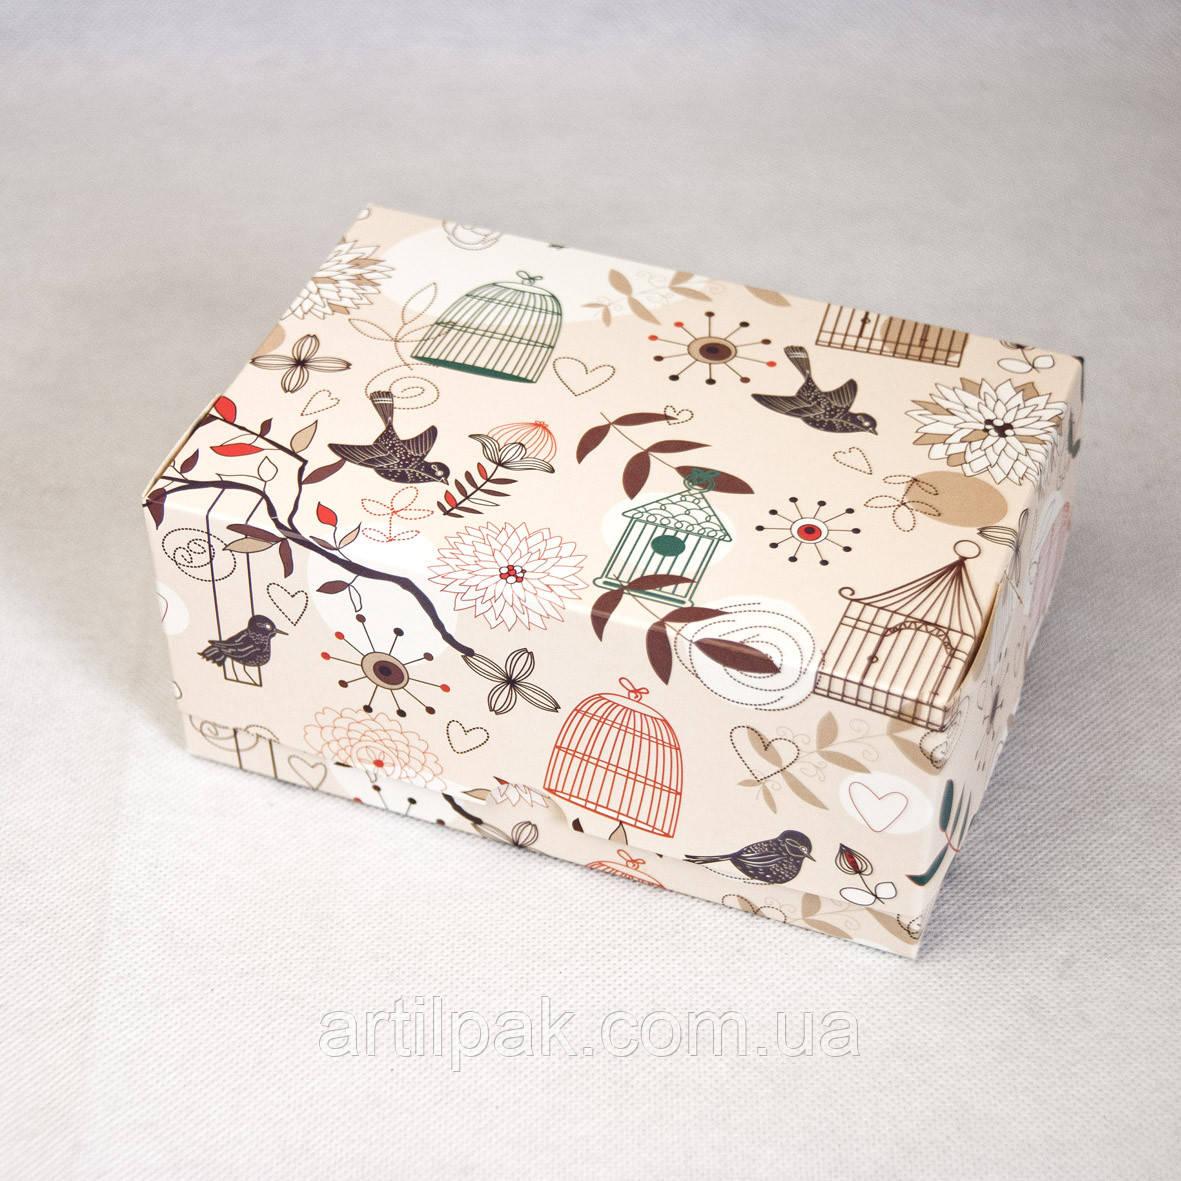 Коробка-контейнер 180*120*80 фон ПТАШКИ